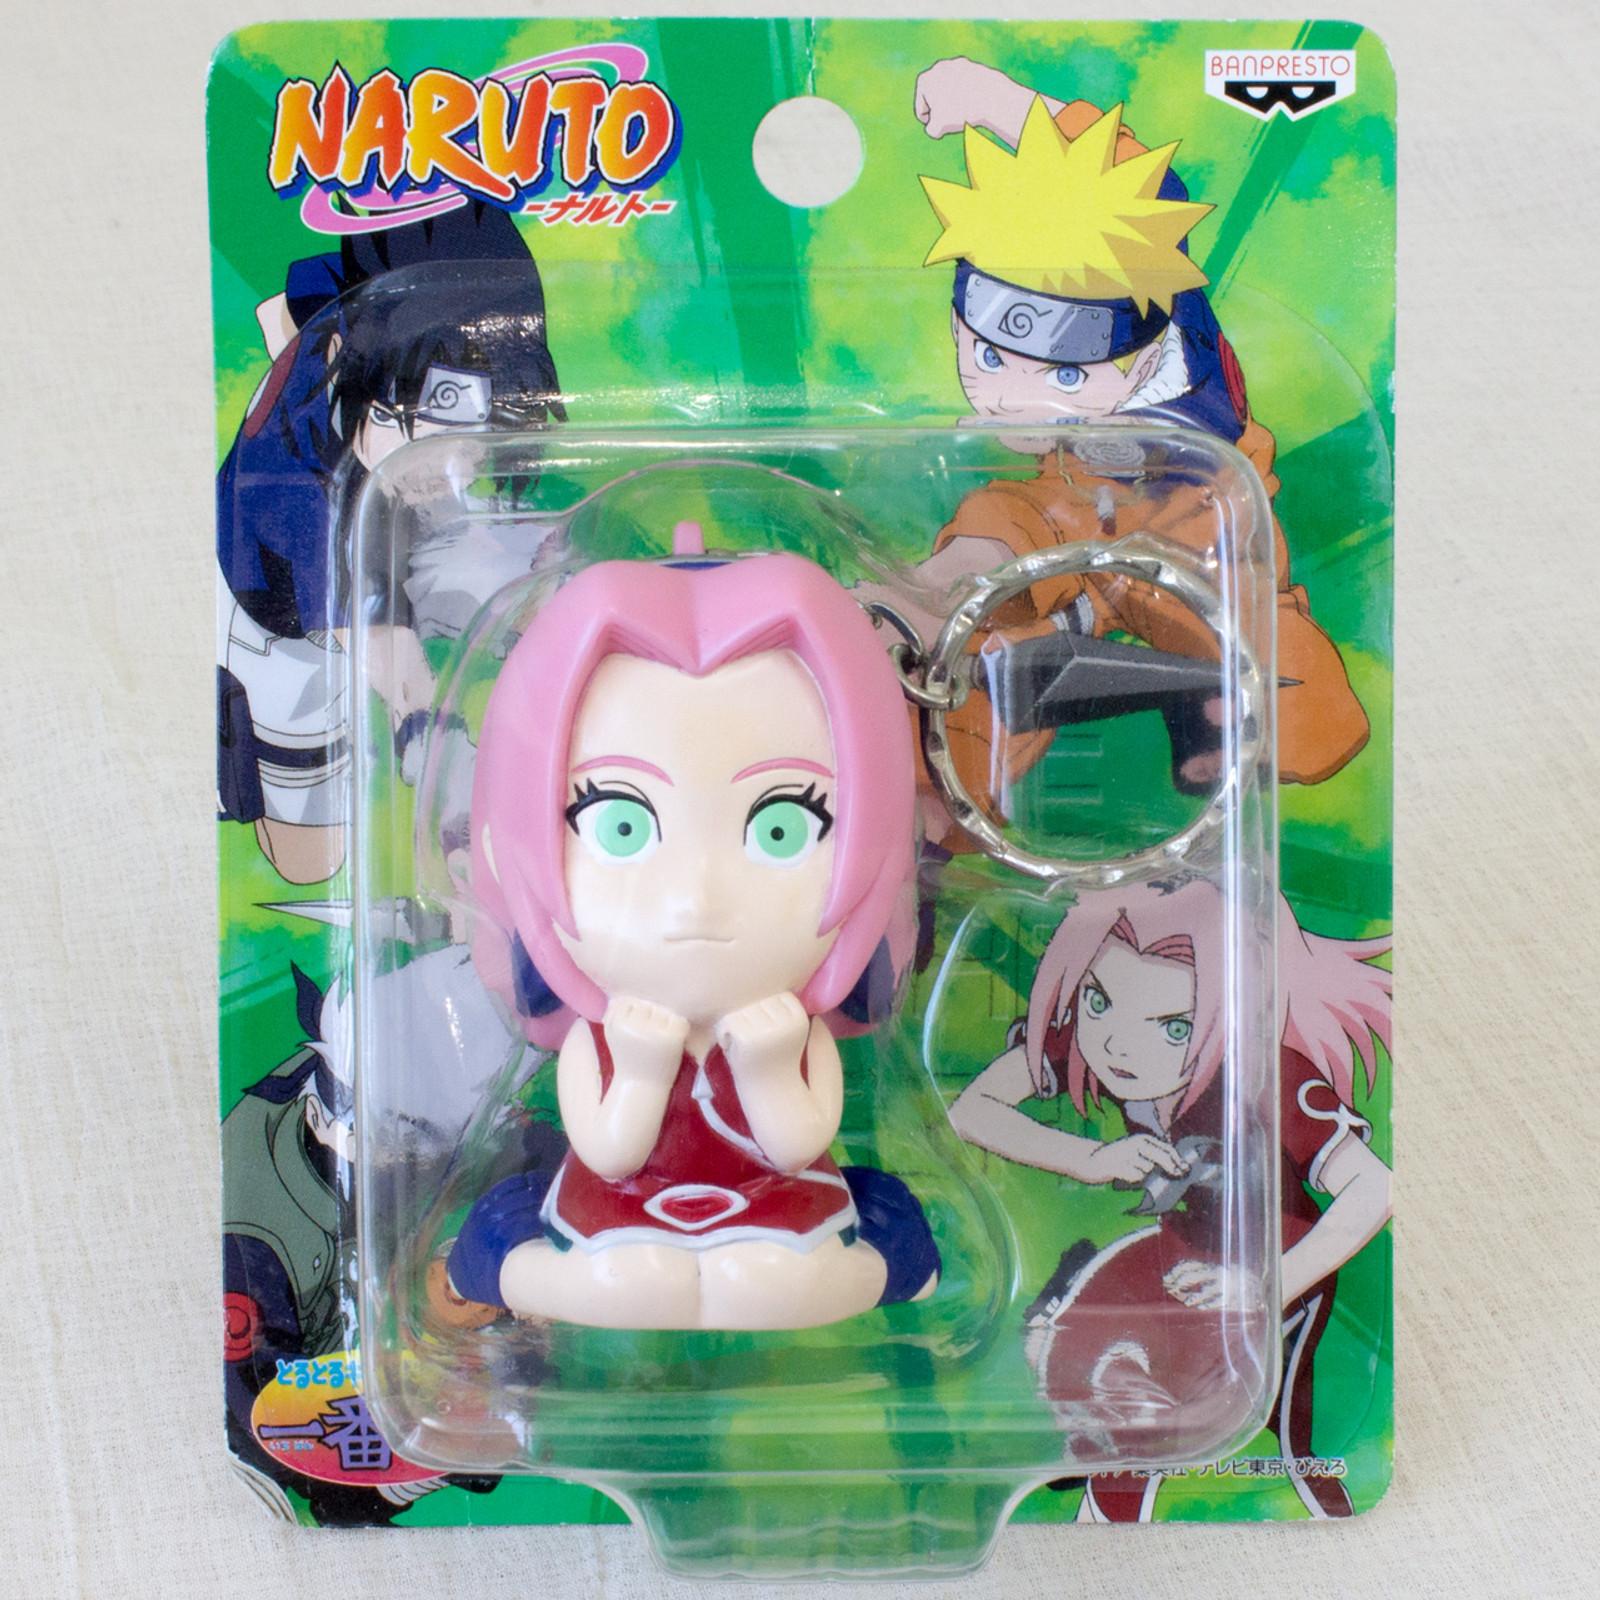 NARUTO Sakura Haruno Keychain Figure Banpresto JAPAN ANIME MANGA JUMP